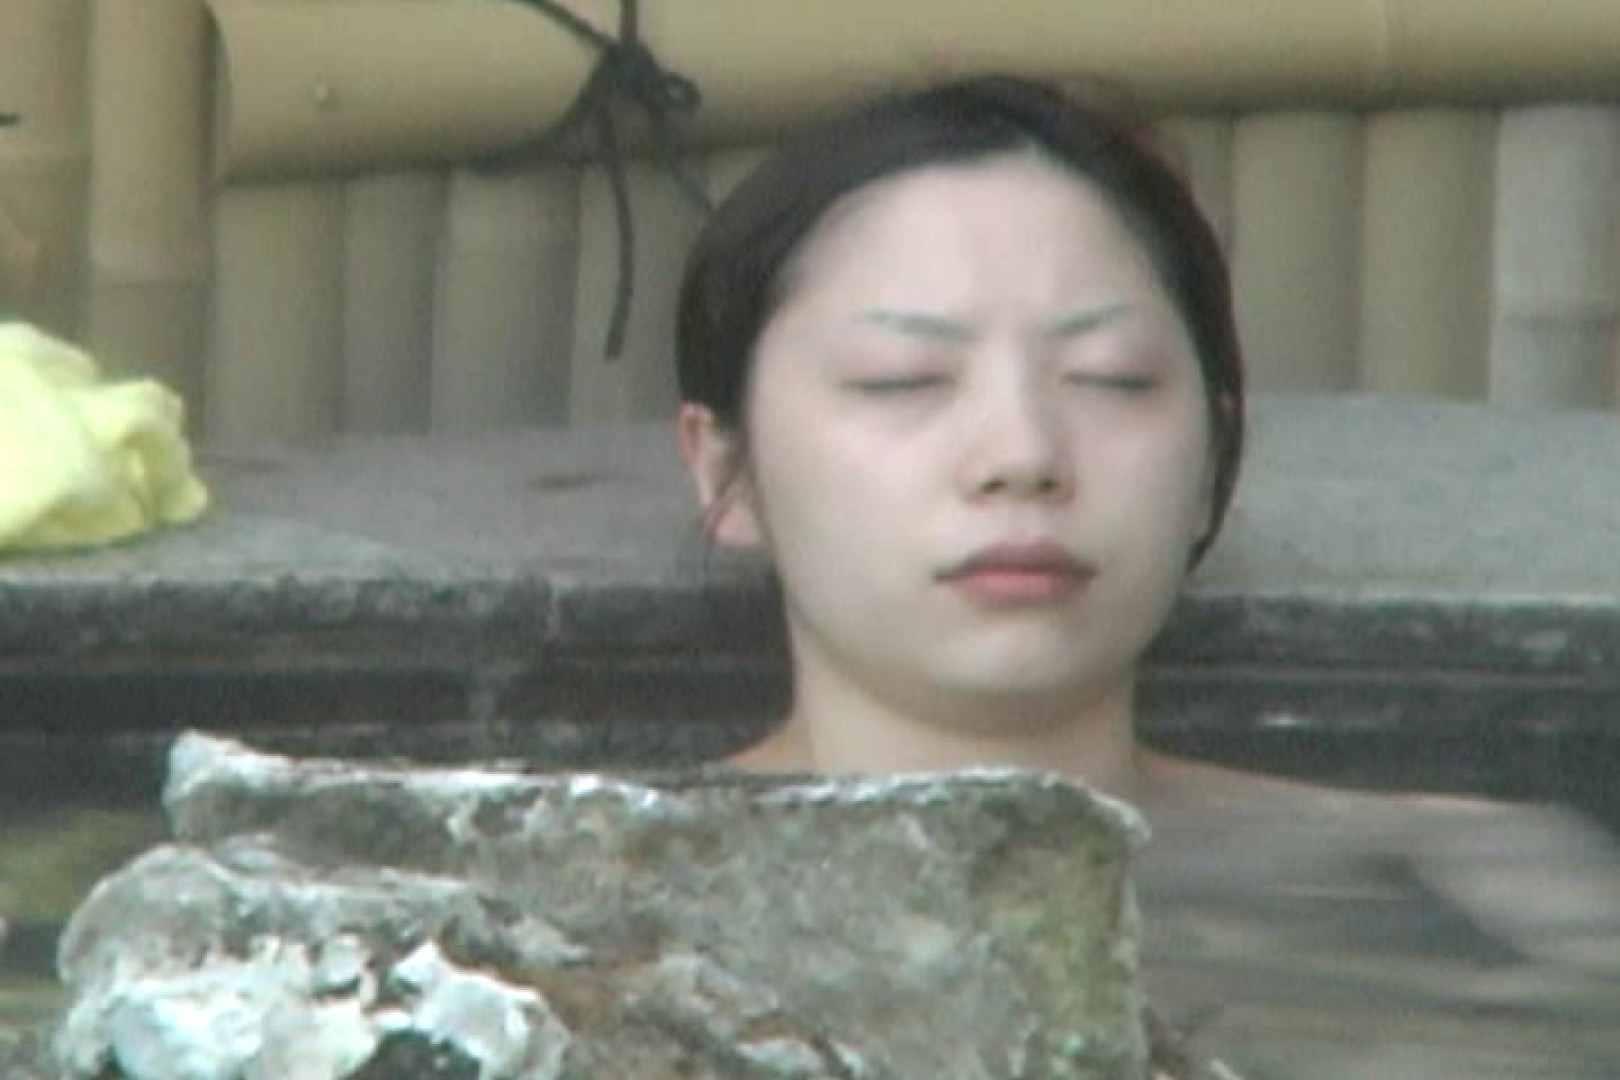 Aquaな露天風呂Vol.596 OLセックス  77画像 48